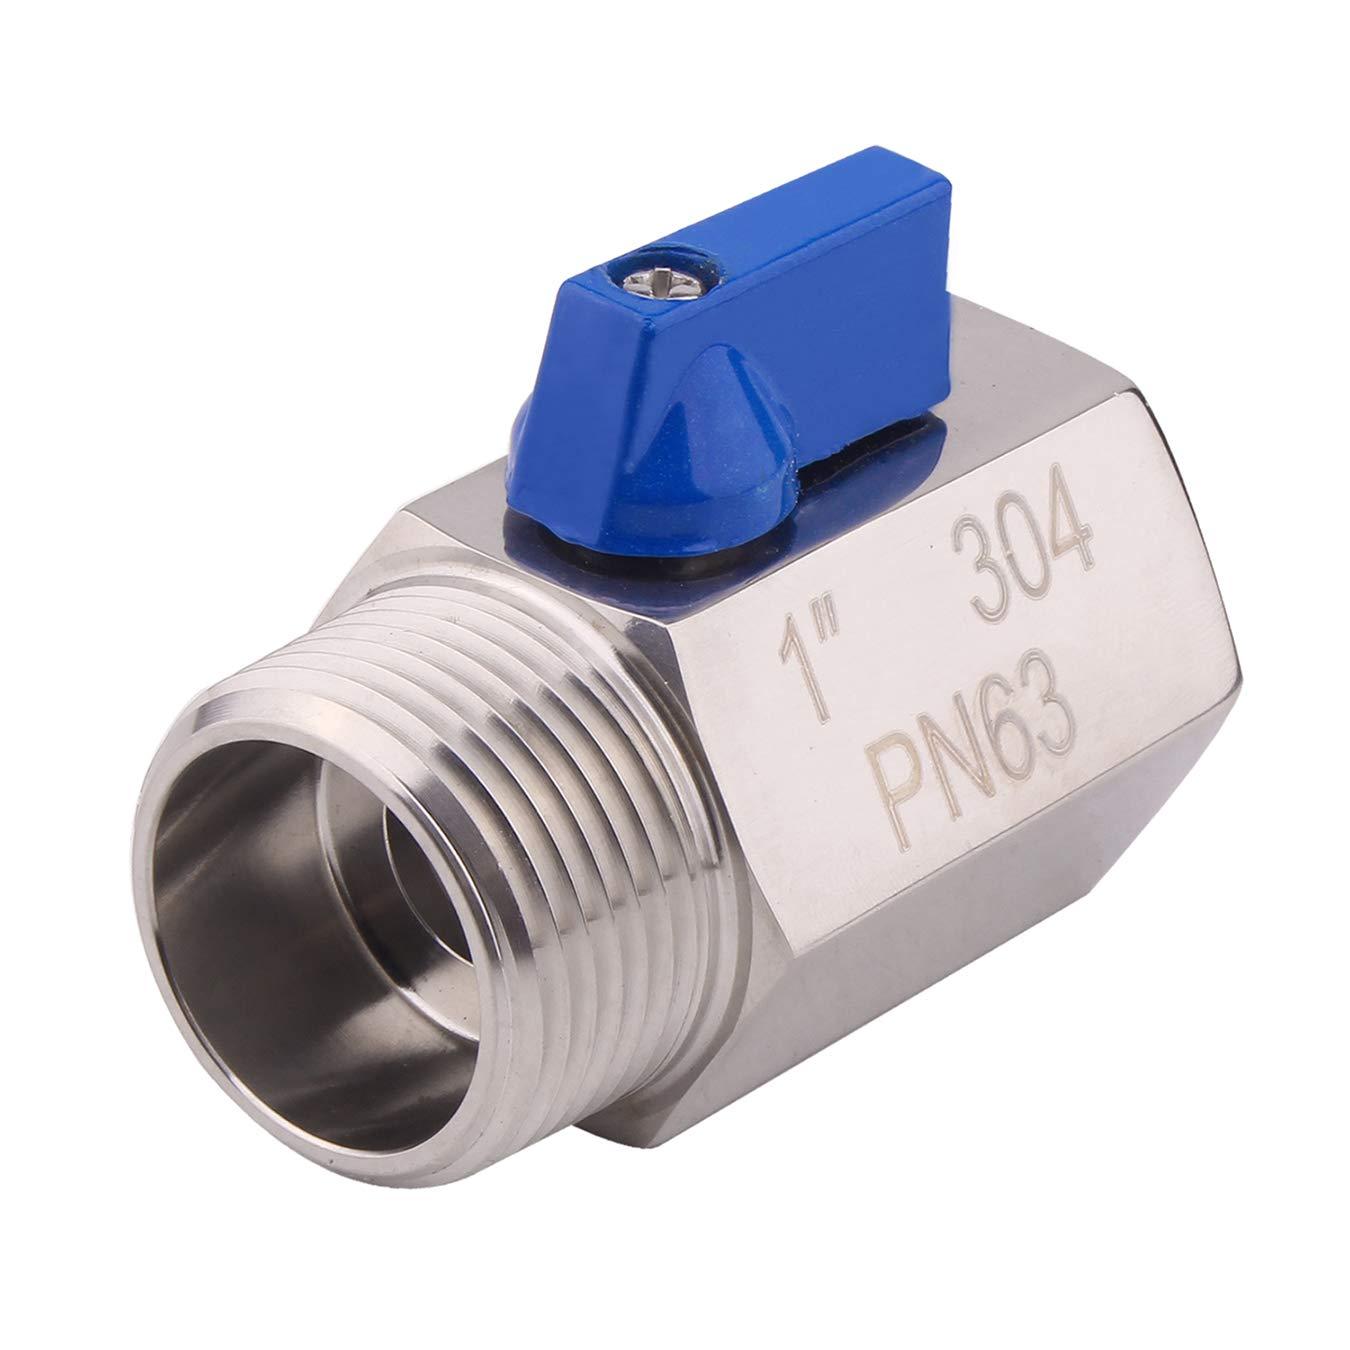 AIICIOO Stainless Steel Mini Ball Valve - NPT Thread with Stainless Handle (1